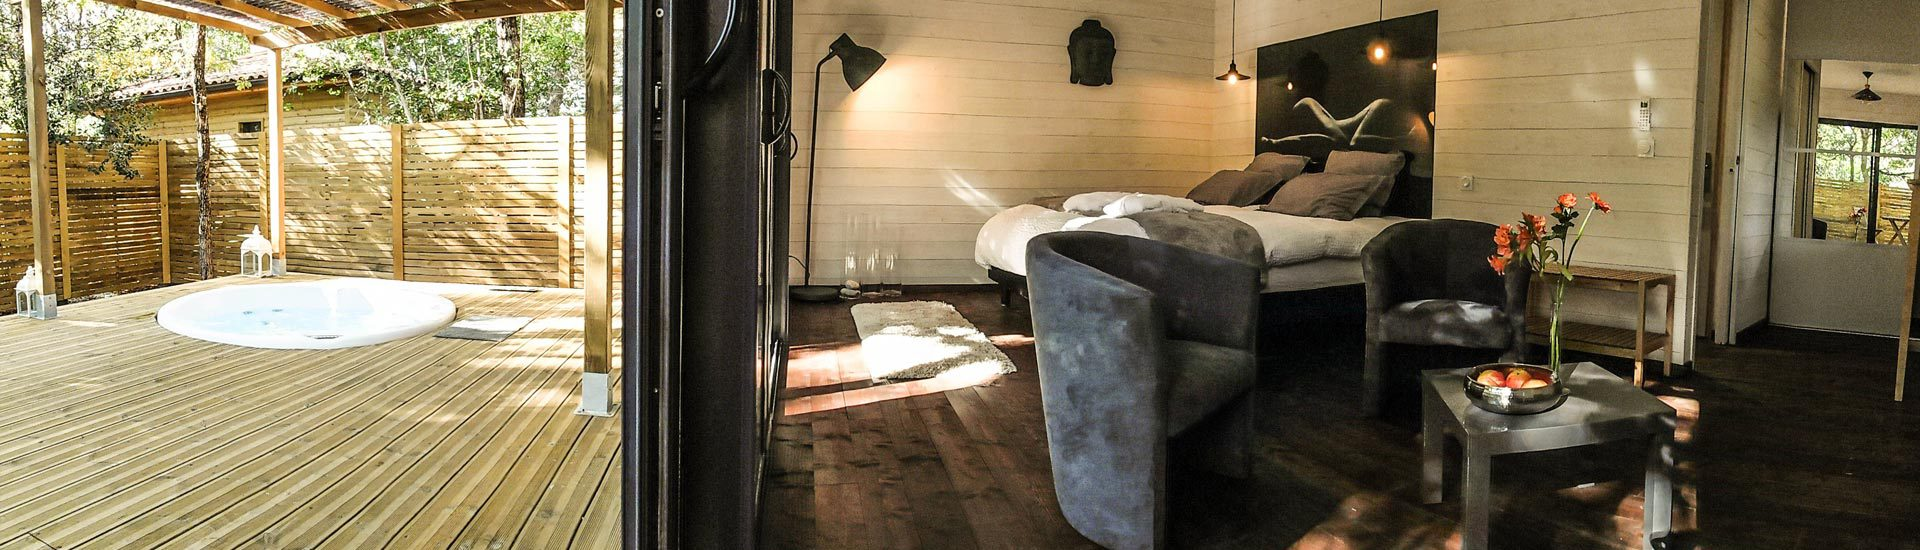 chambres-hotes-cabane-audenge-bordeaux-chambre-spa